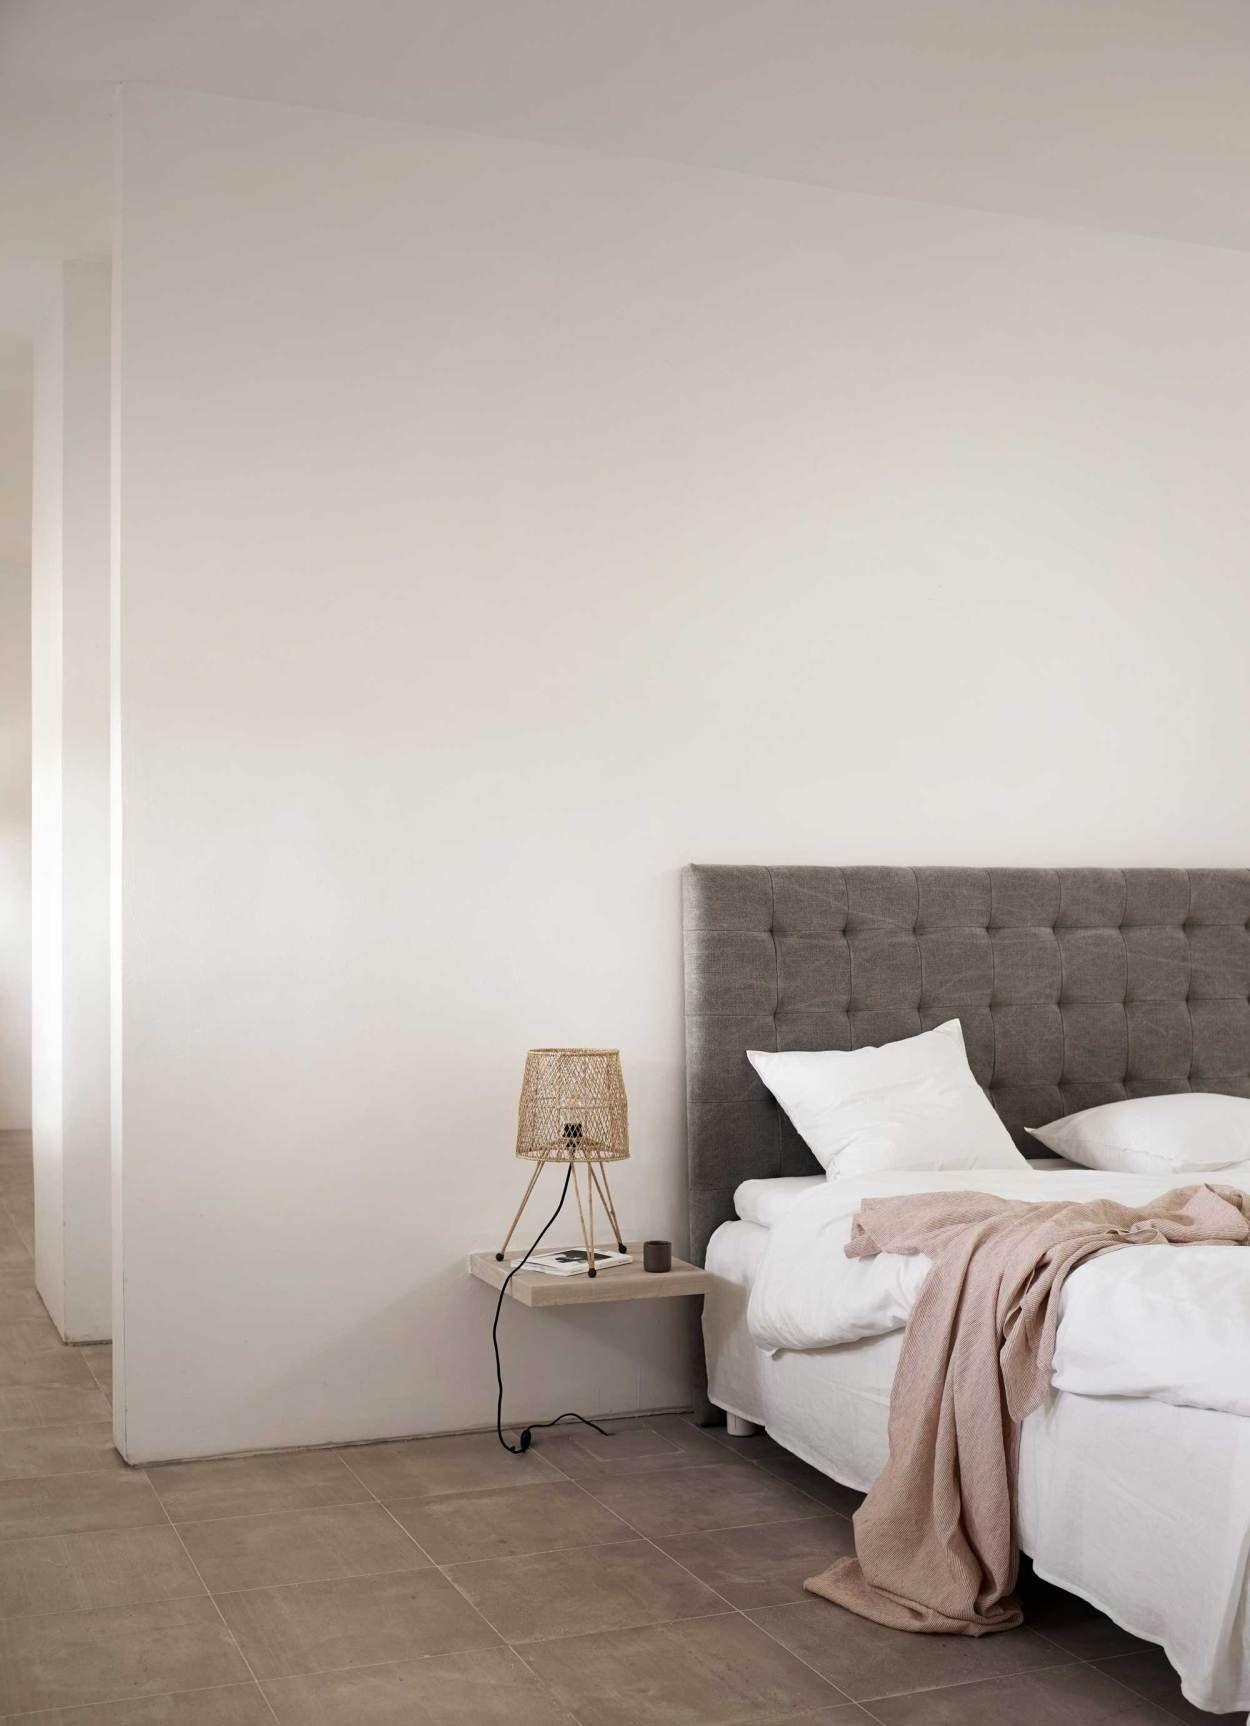 minimalisme detachement objets chambre